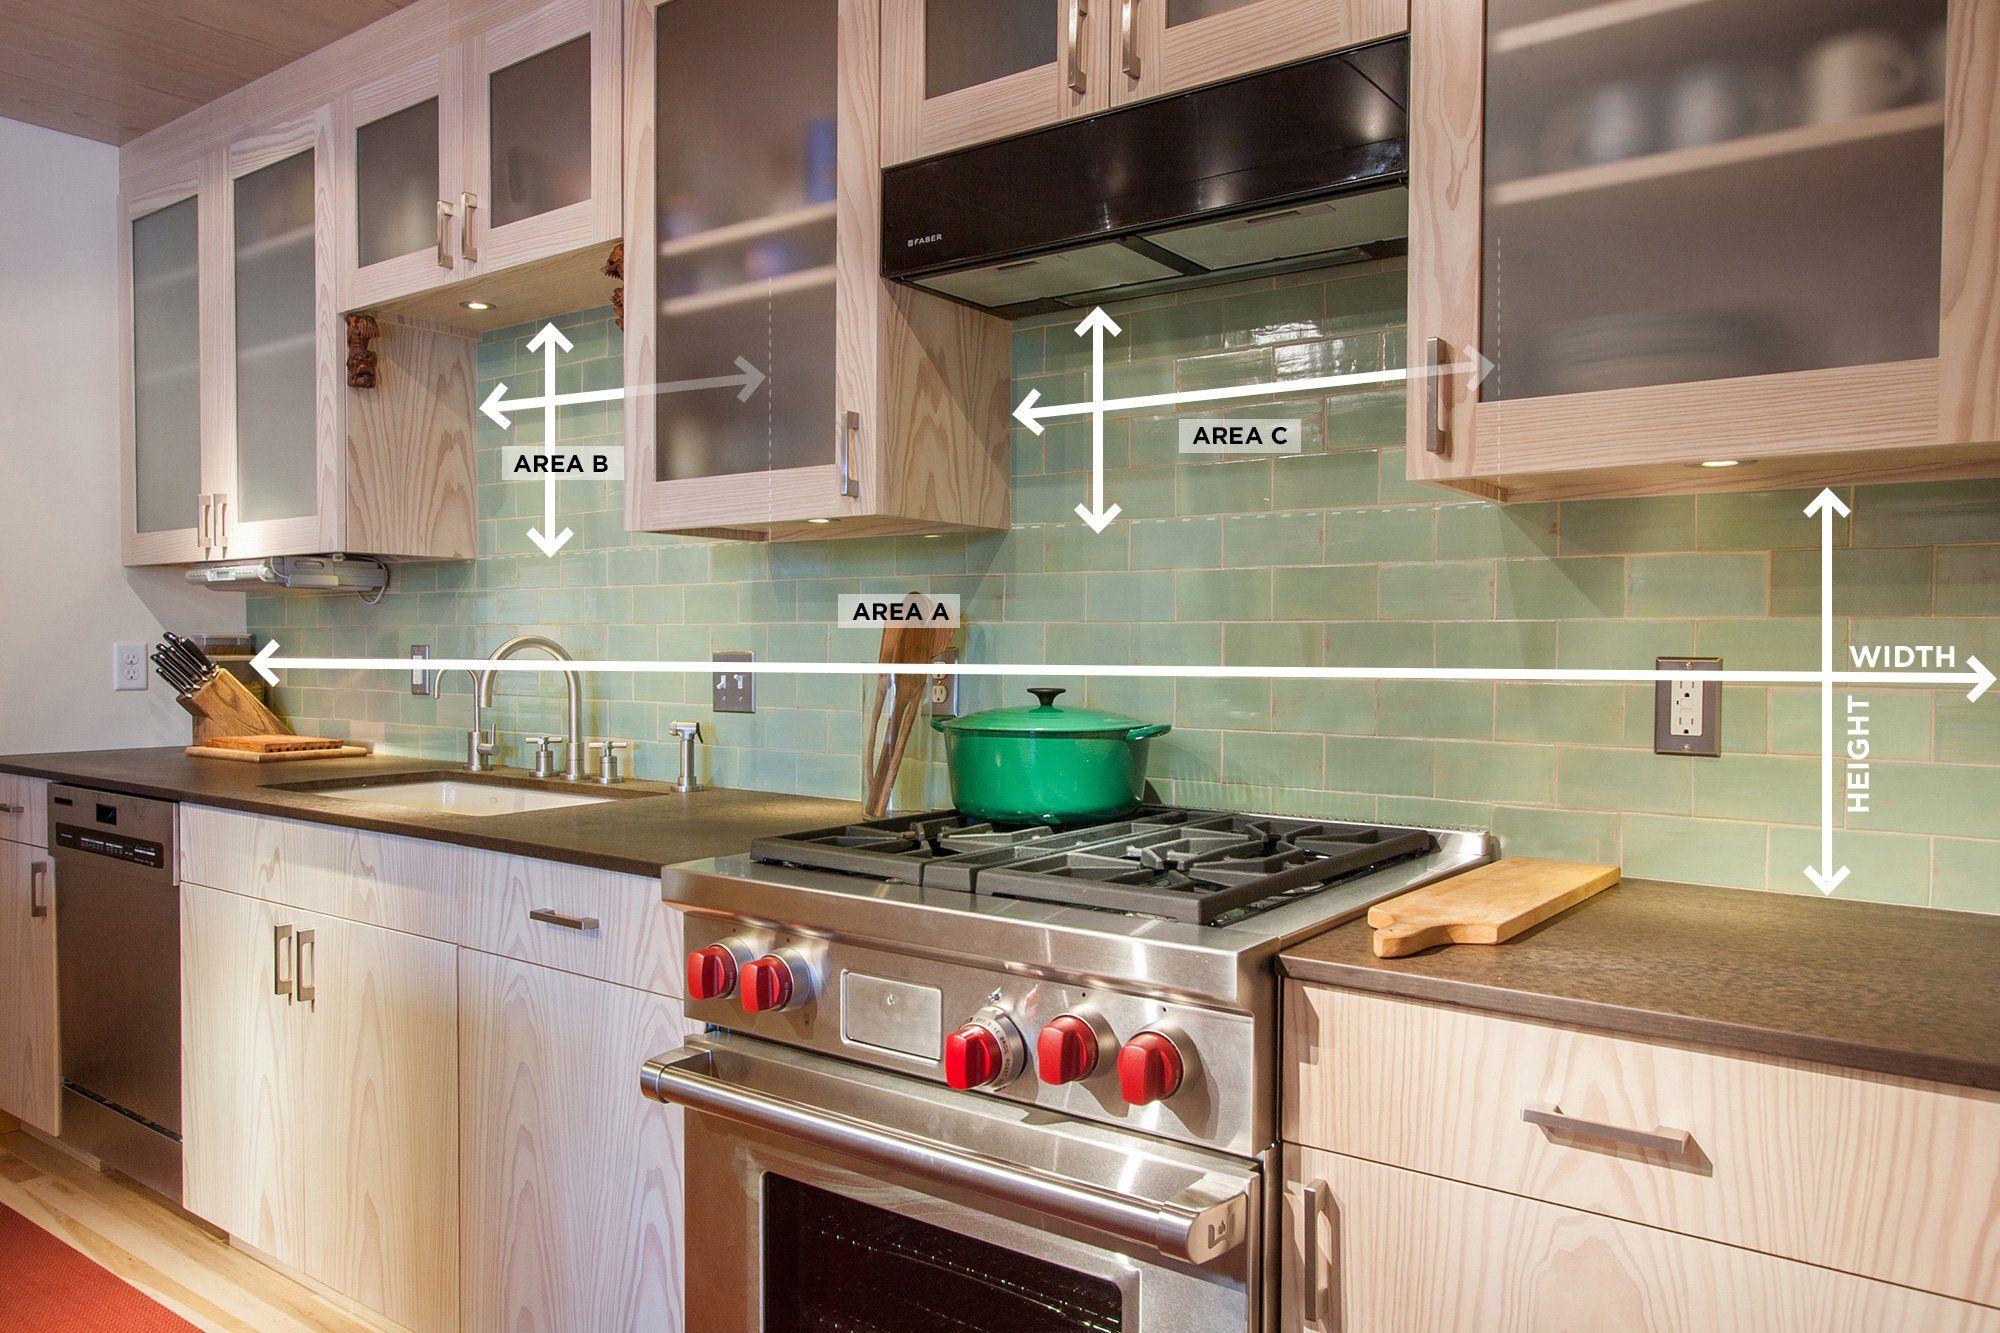 How to measure your kitchen backsplash handmade tile